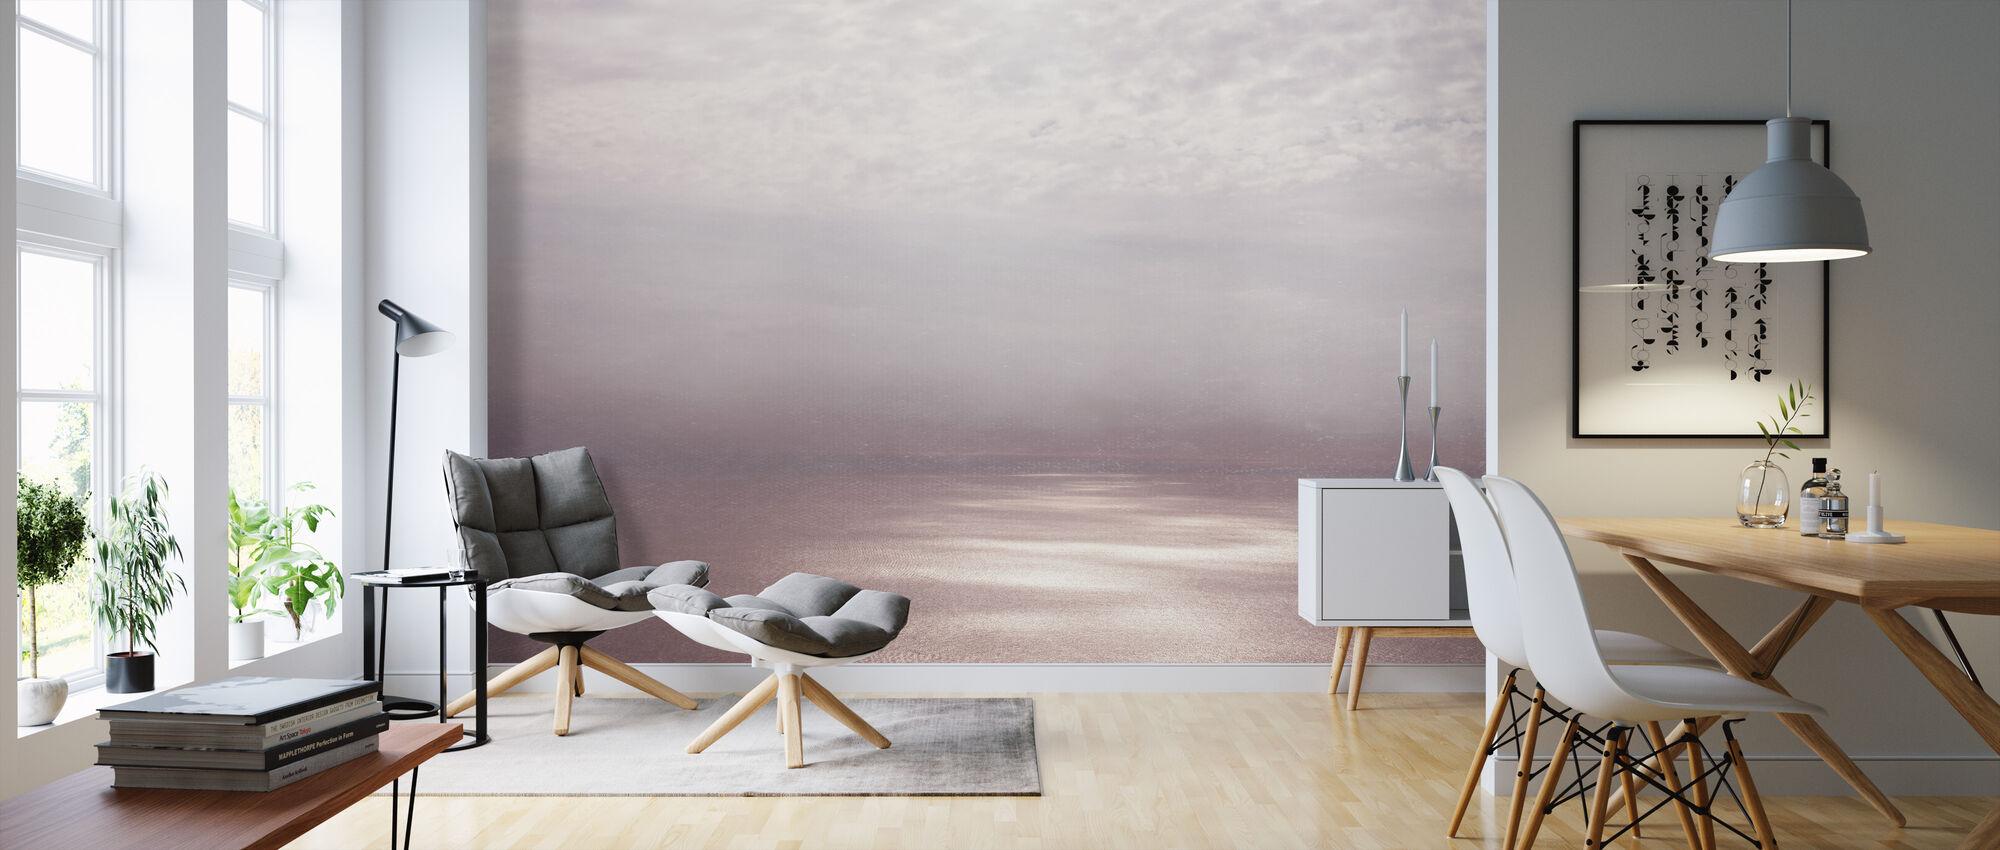 Smoke Horizon Dawn Filter - Wallpaper - Living Room